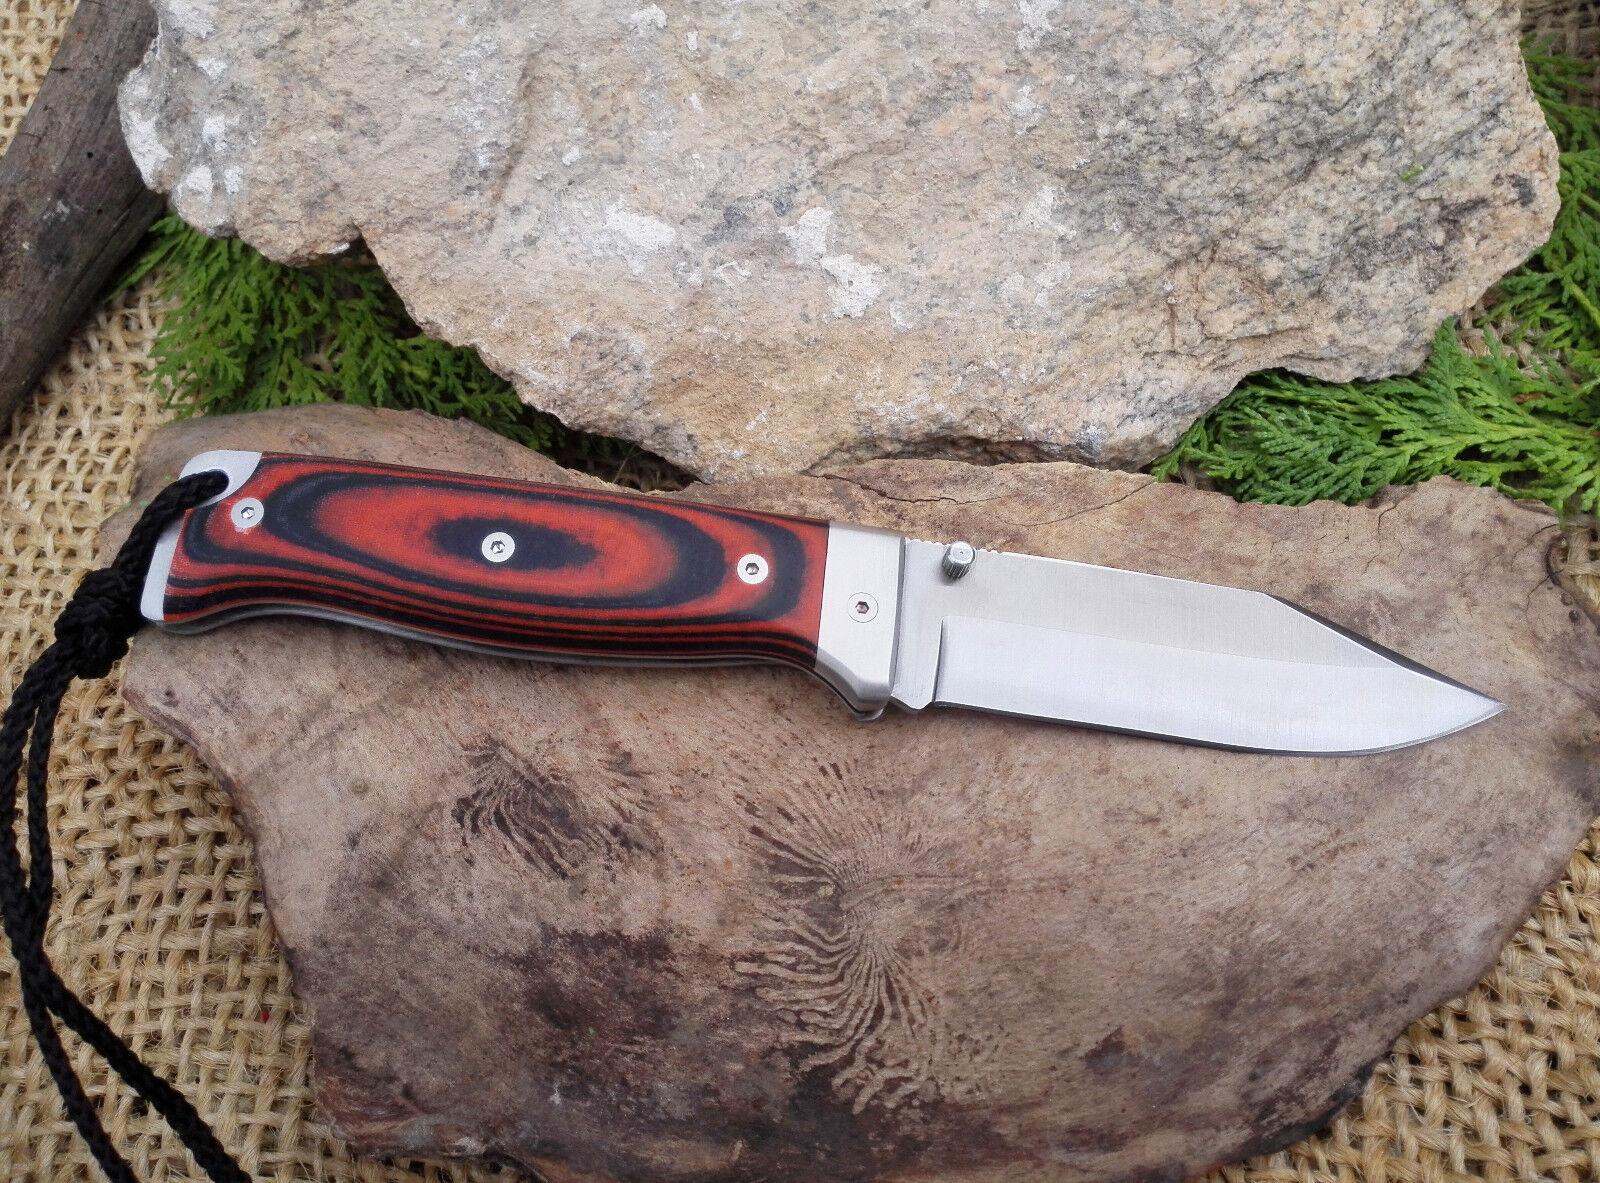 Navaja CUDEMAN MT-7 Hoja 10,9 Acero cm Acero 10,9 Bohler N695 Micarta Naranja Knive Messer 526dfd